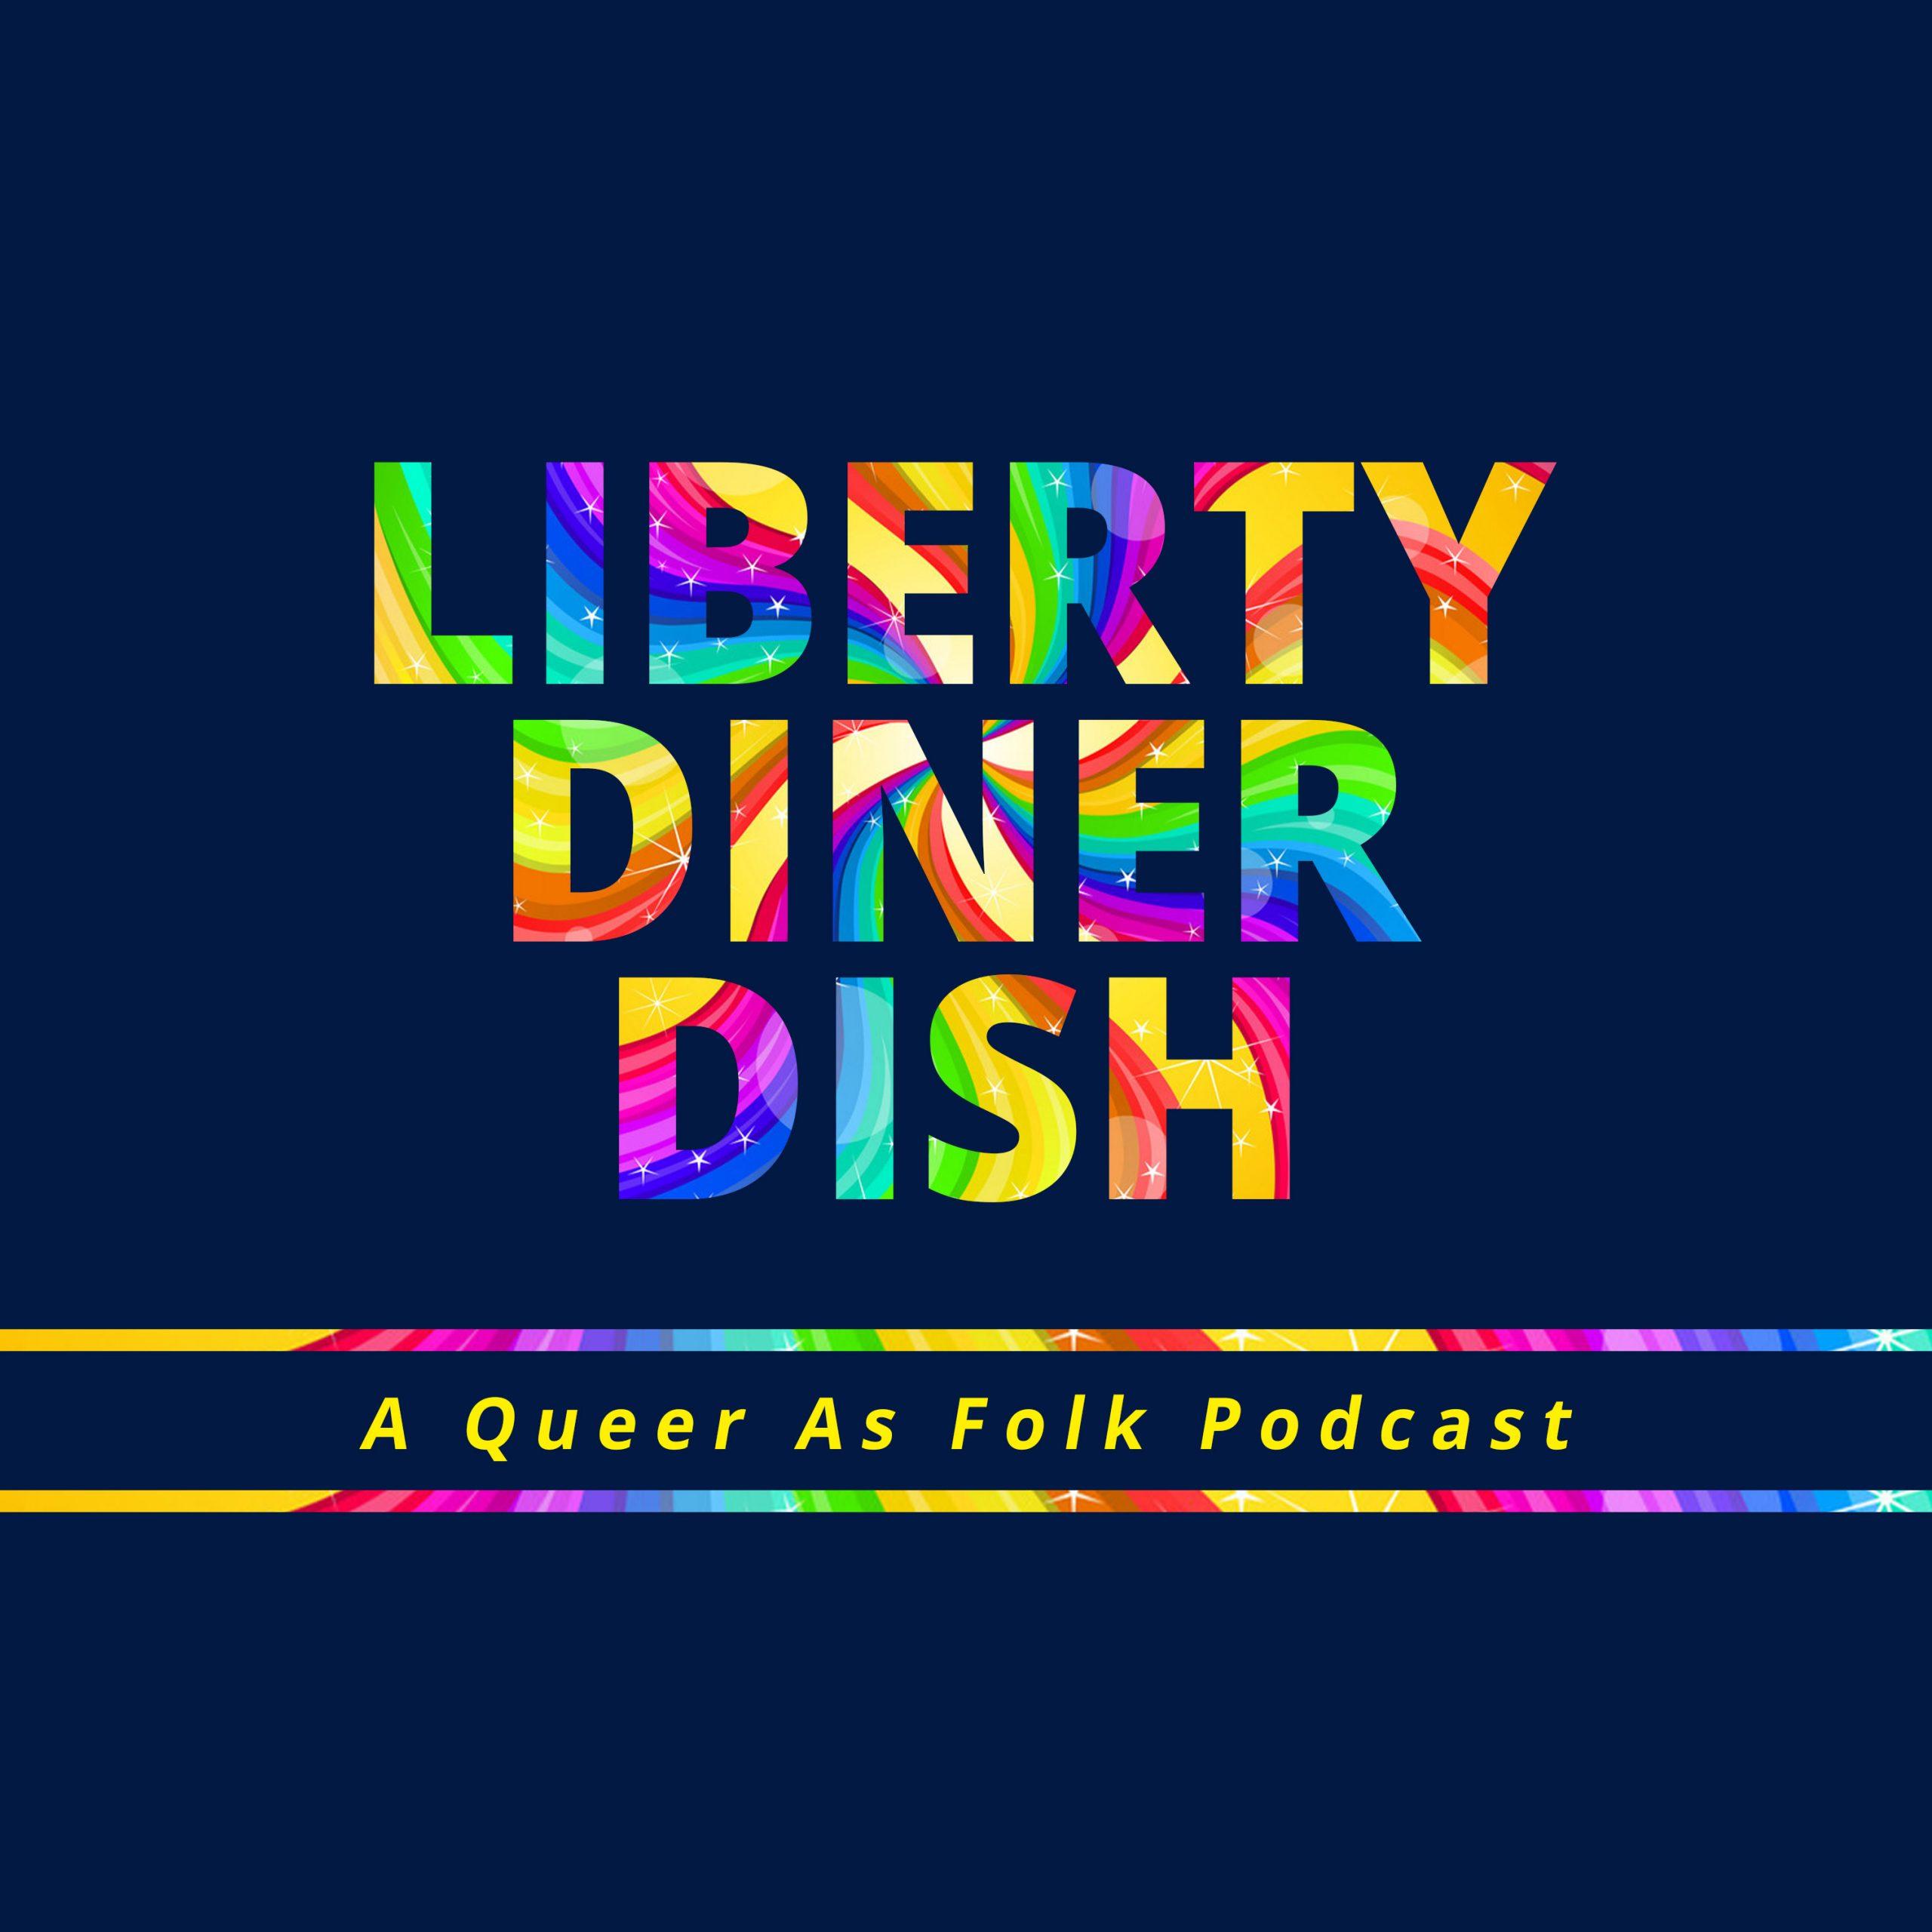 Liberty Diner Dish